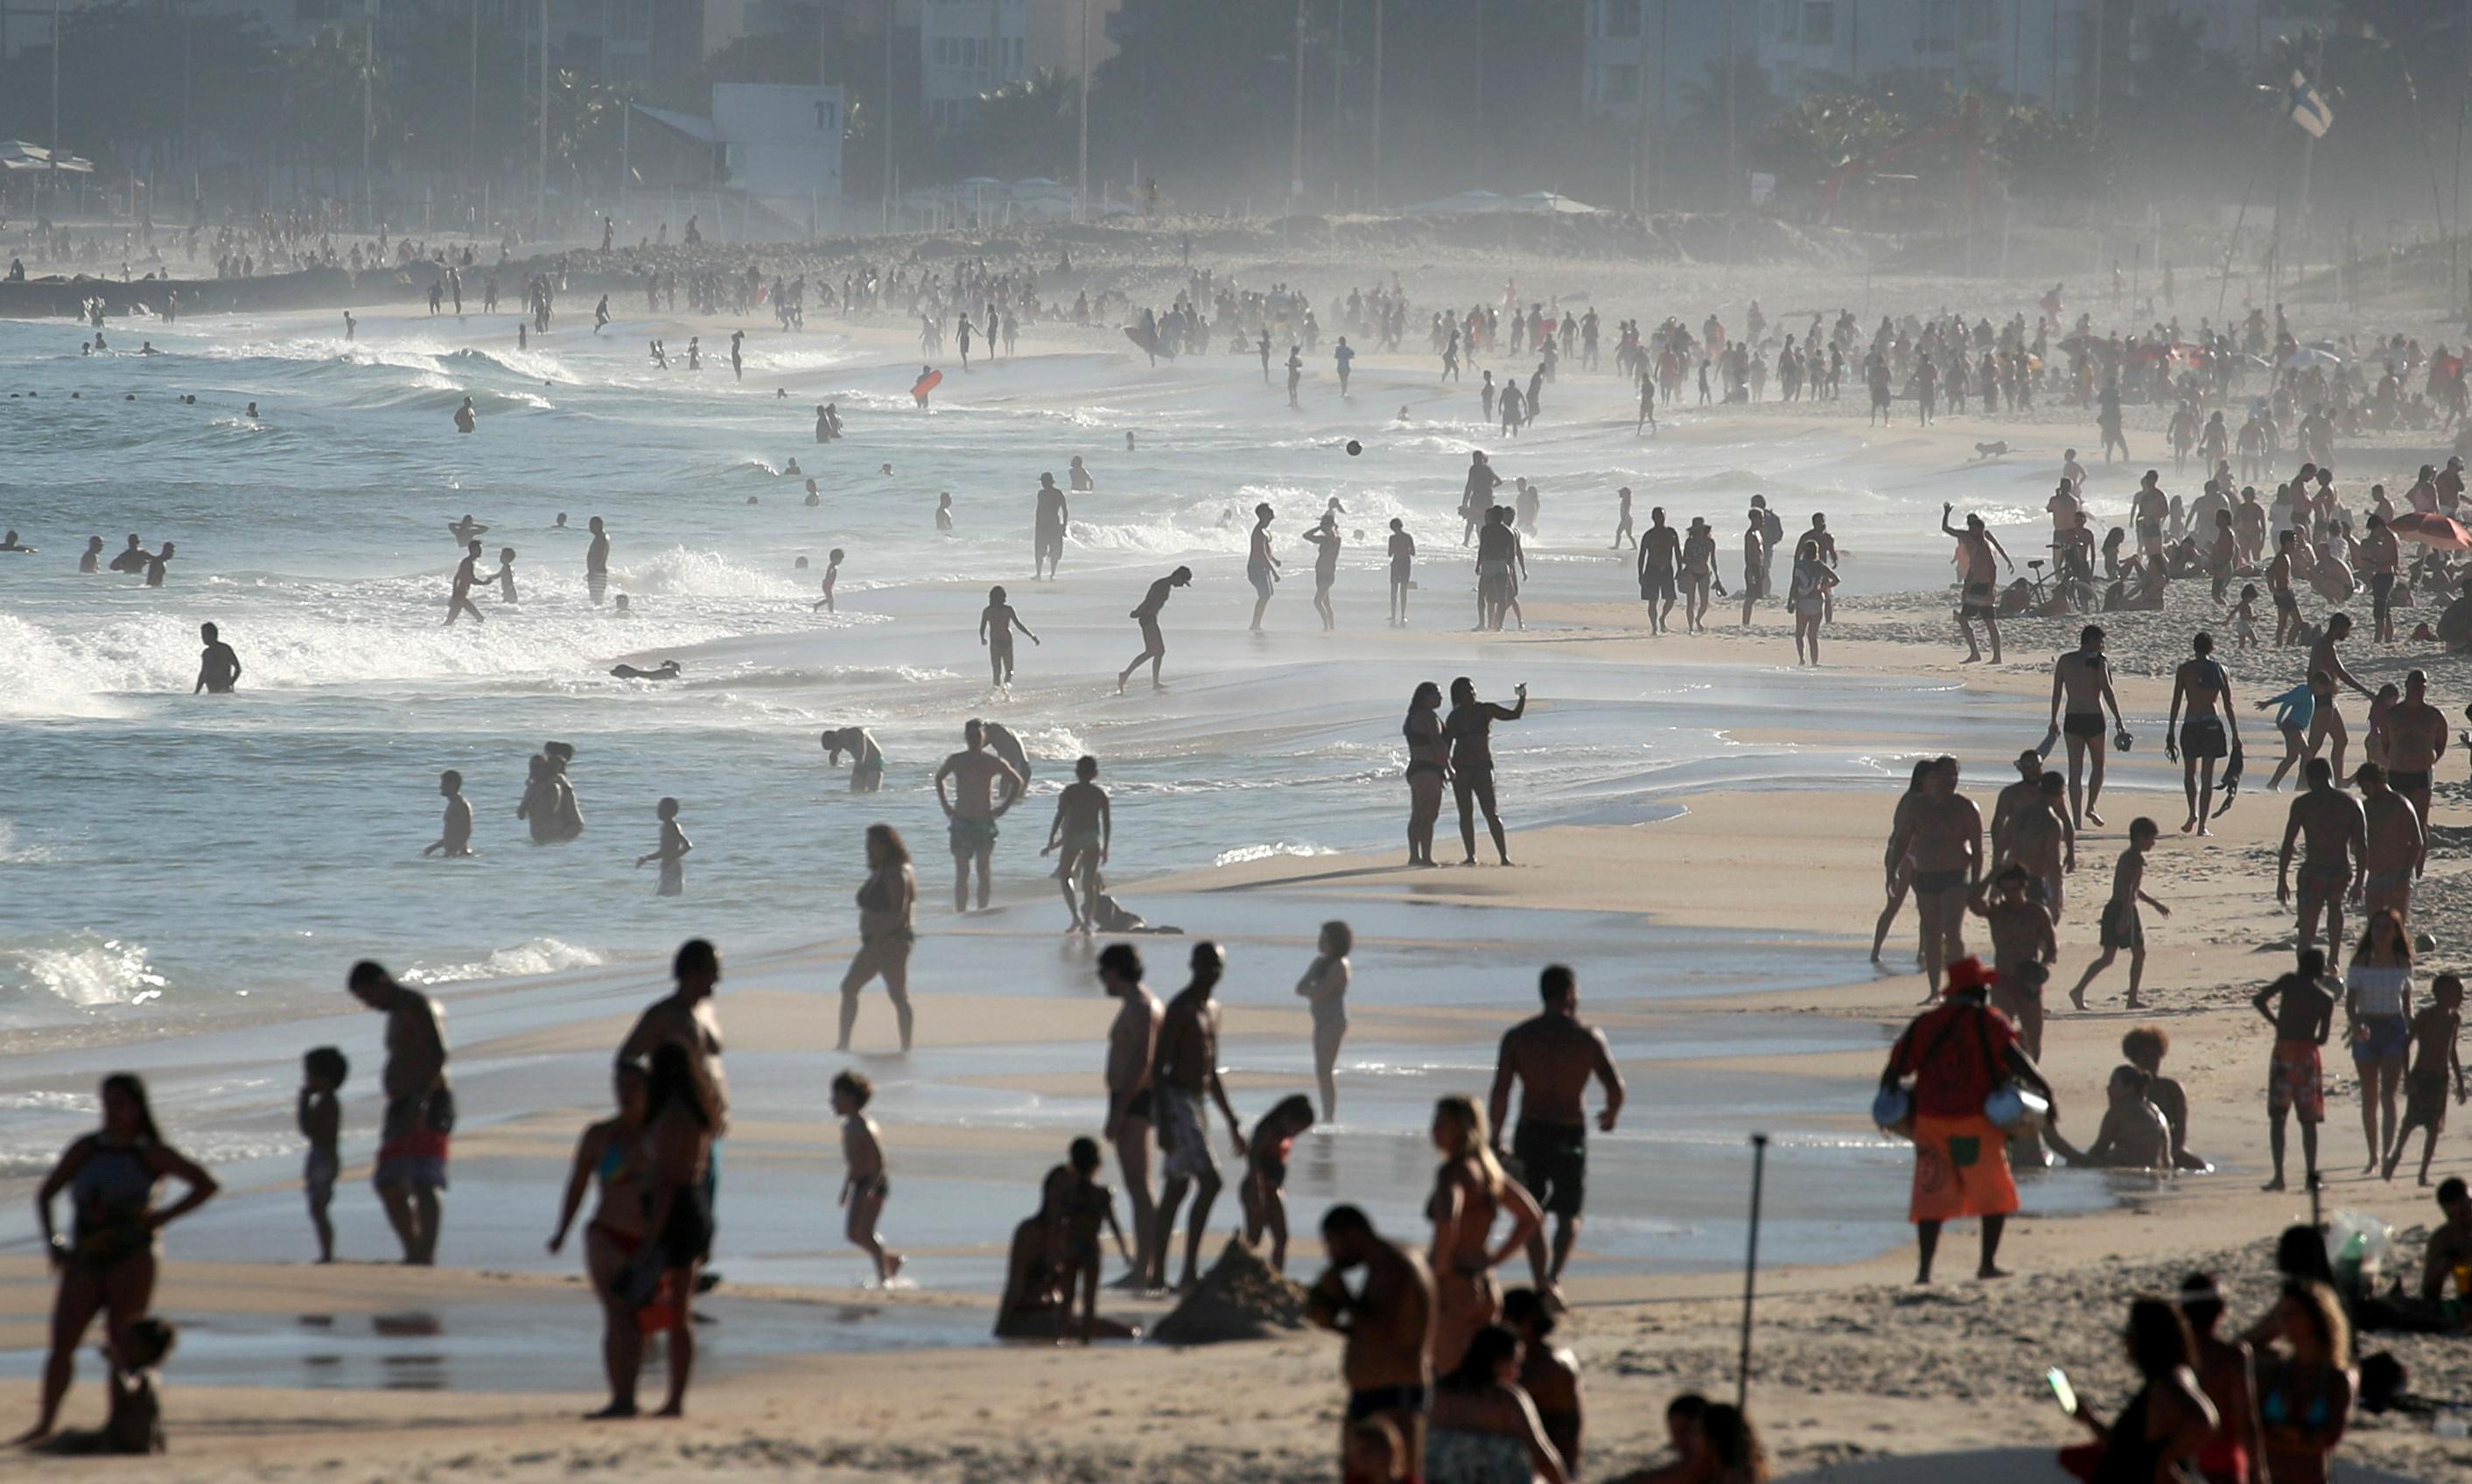 FILE PHOTO: Beachgoers enjoy Ipanema beach amid the coronavirus disease (COVID-19) outbreak in Rio de Janeiro, Brazil, June 21, 2020. Photo: Reuters